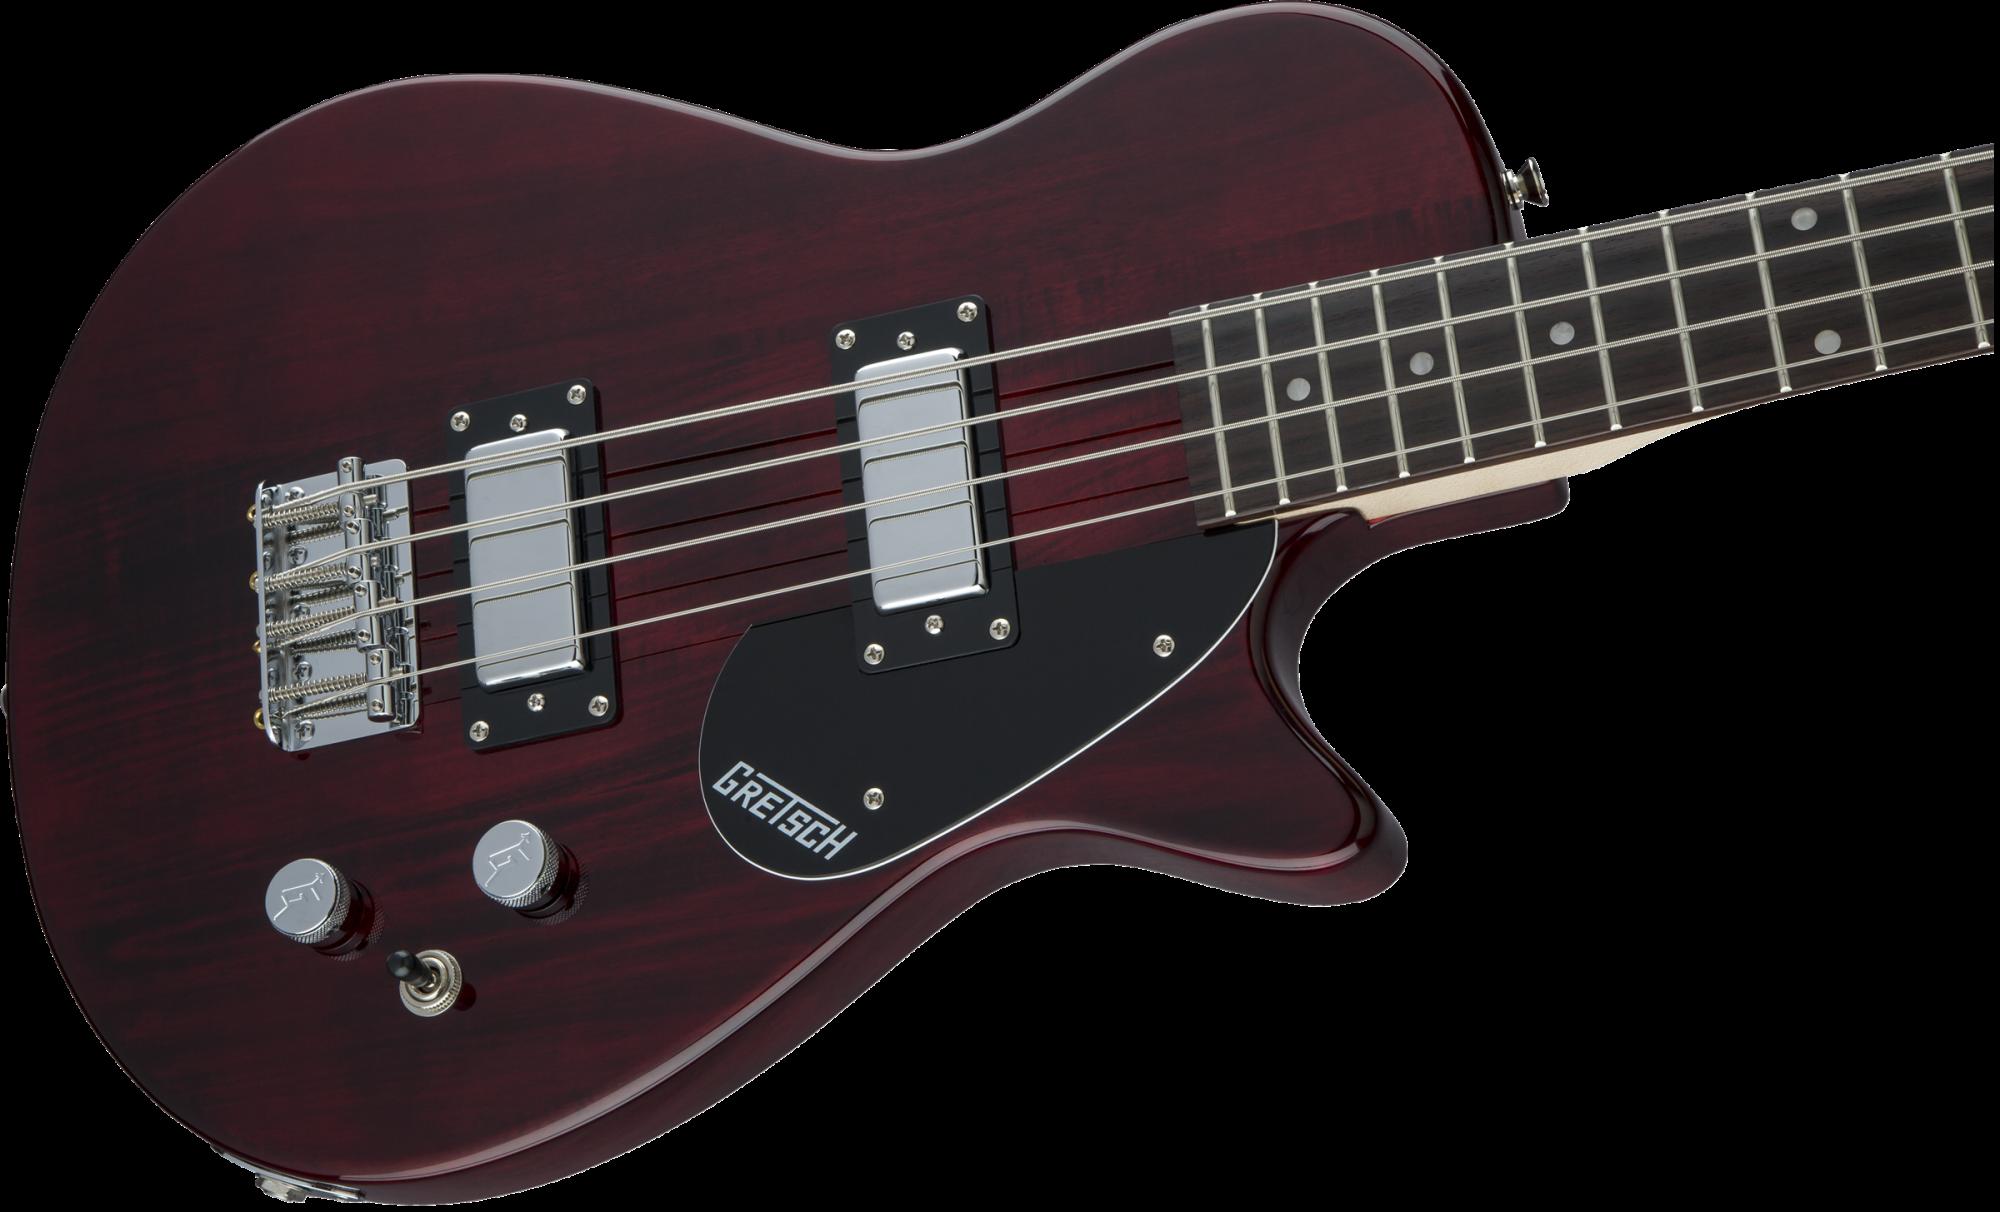 Gretsch G2220 Electromatic Junior Jet Bass II Short-Scale - Walnut Stain